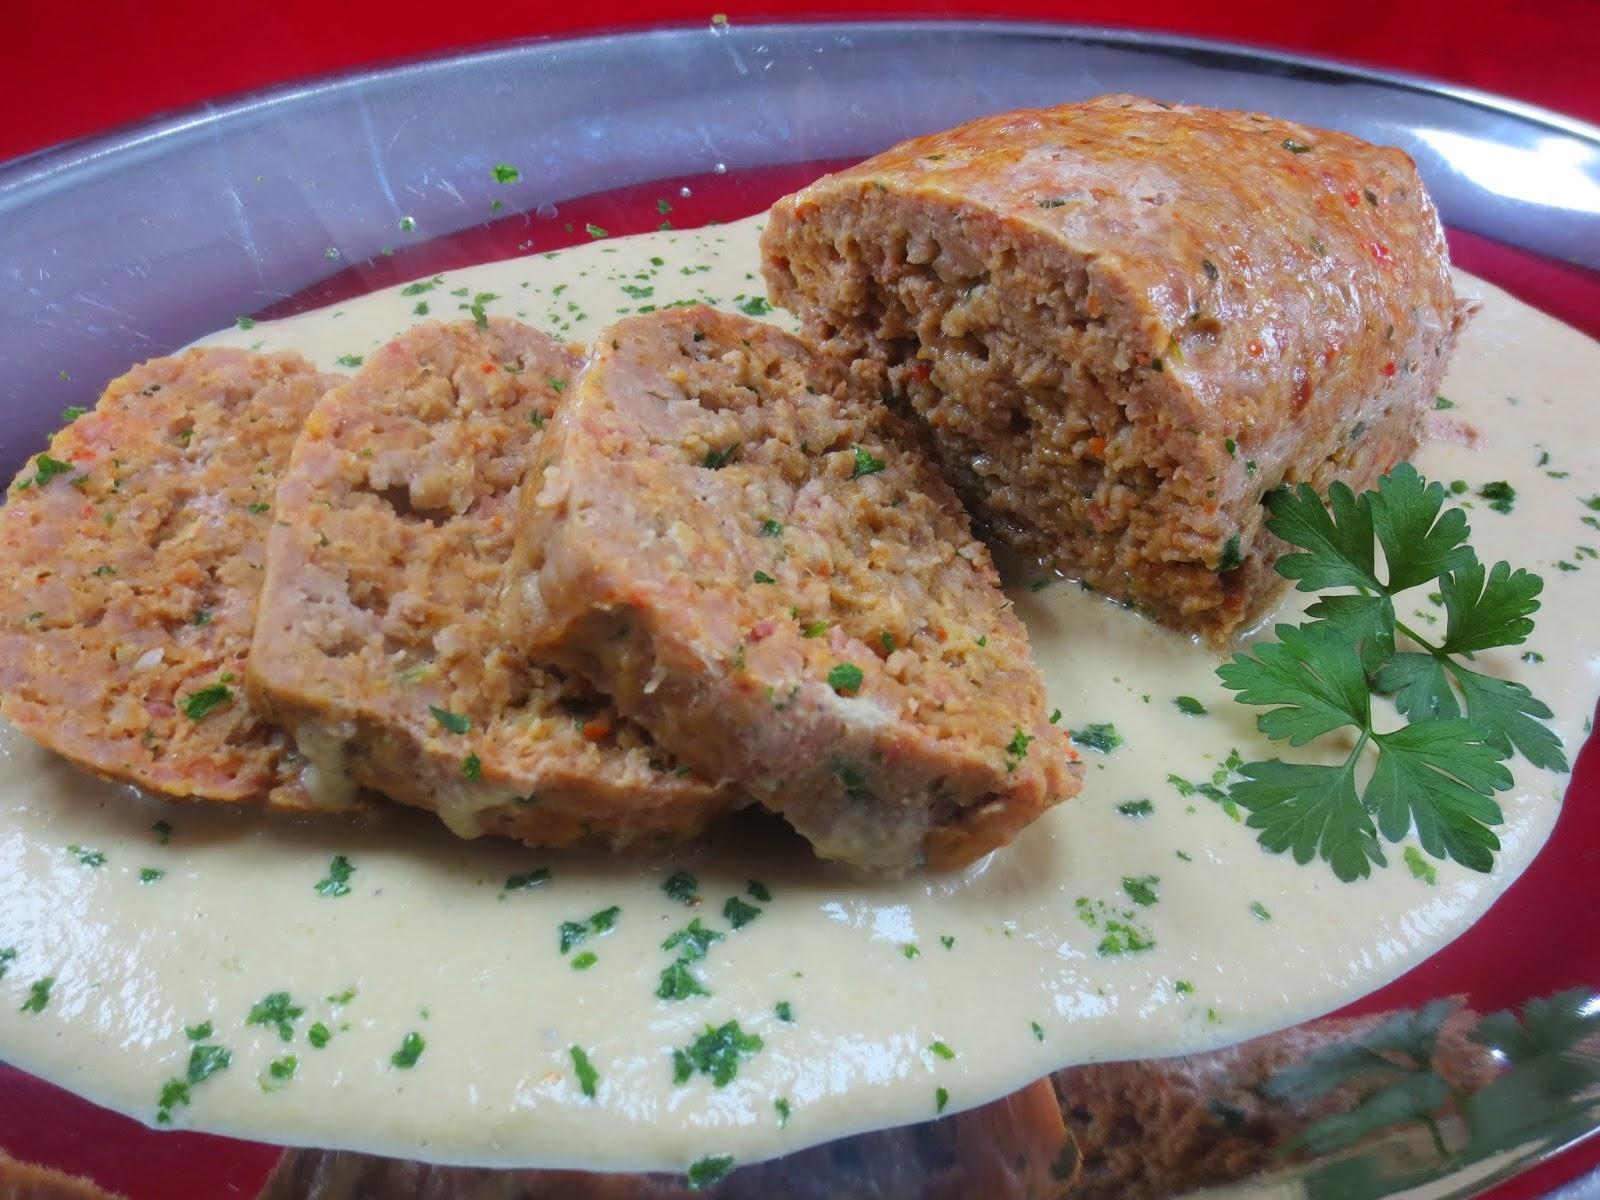 Rollos de carne en salsa de champiñones Ana Sevilla cocina tradicional